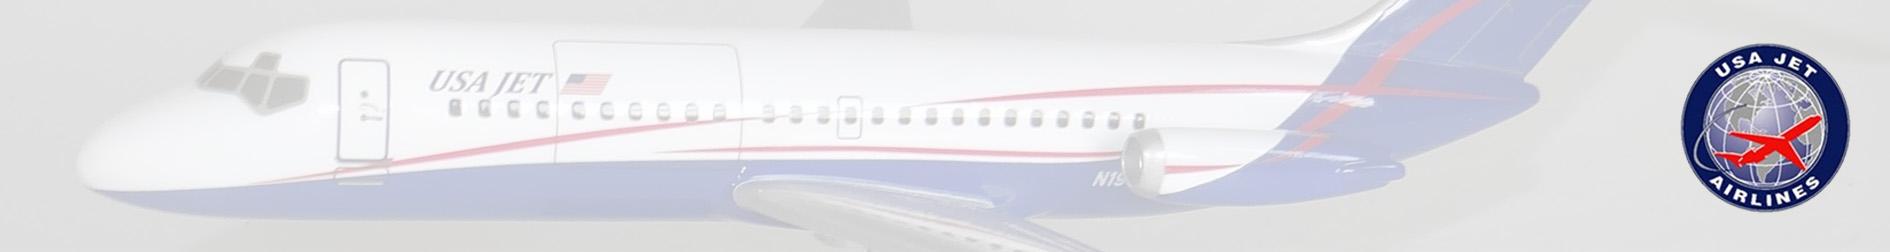 usa-jet.jpg